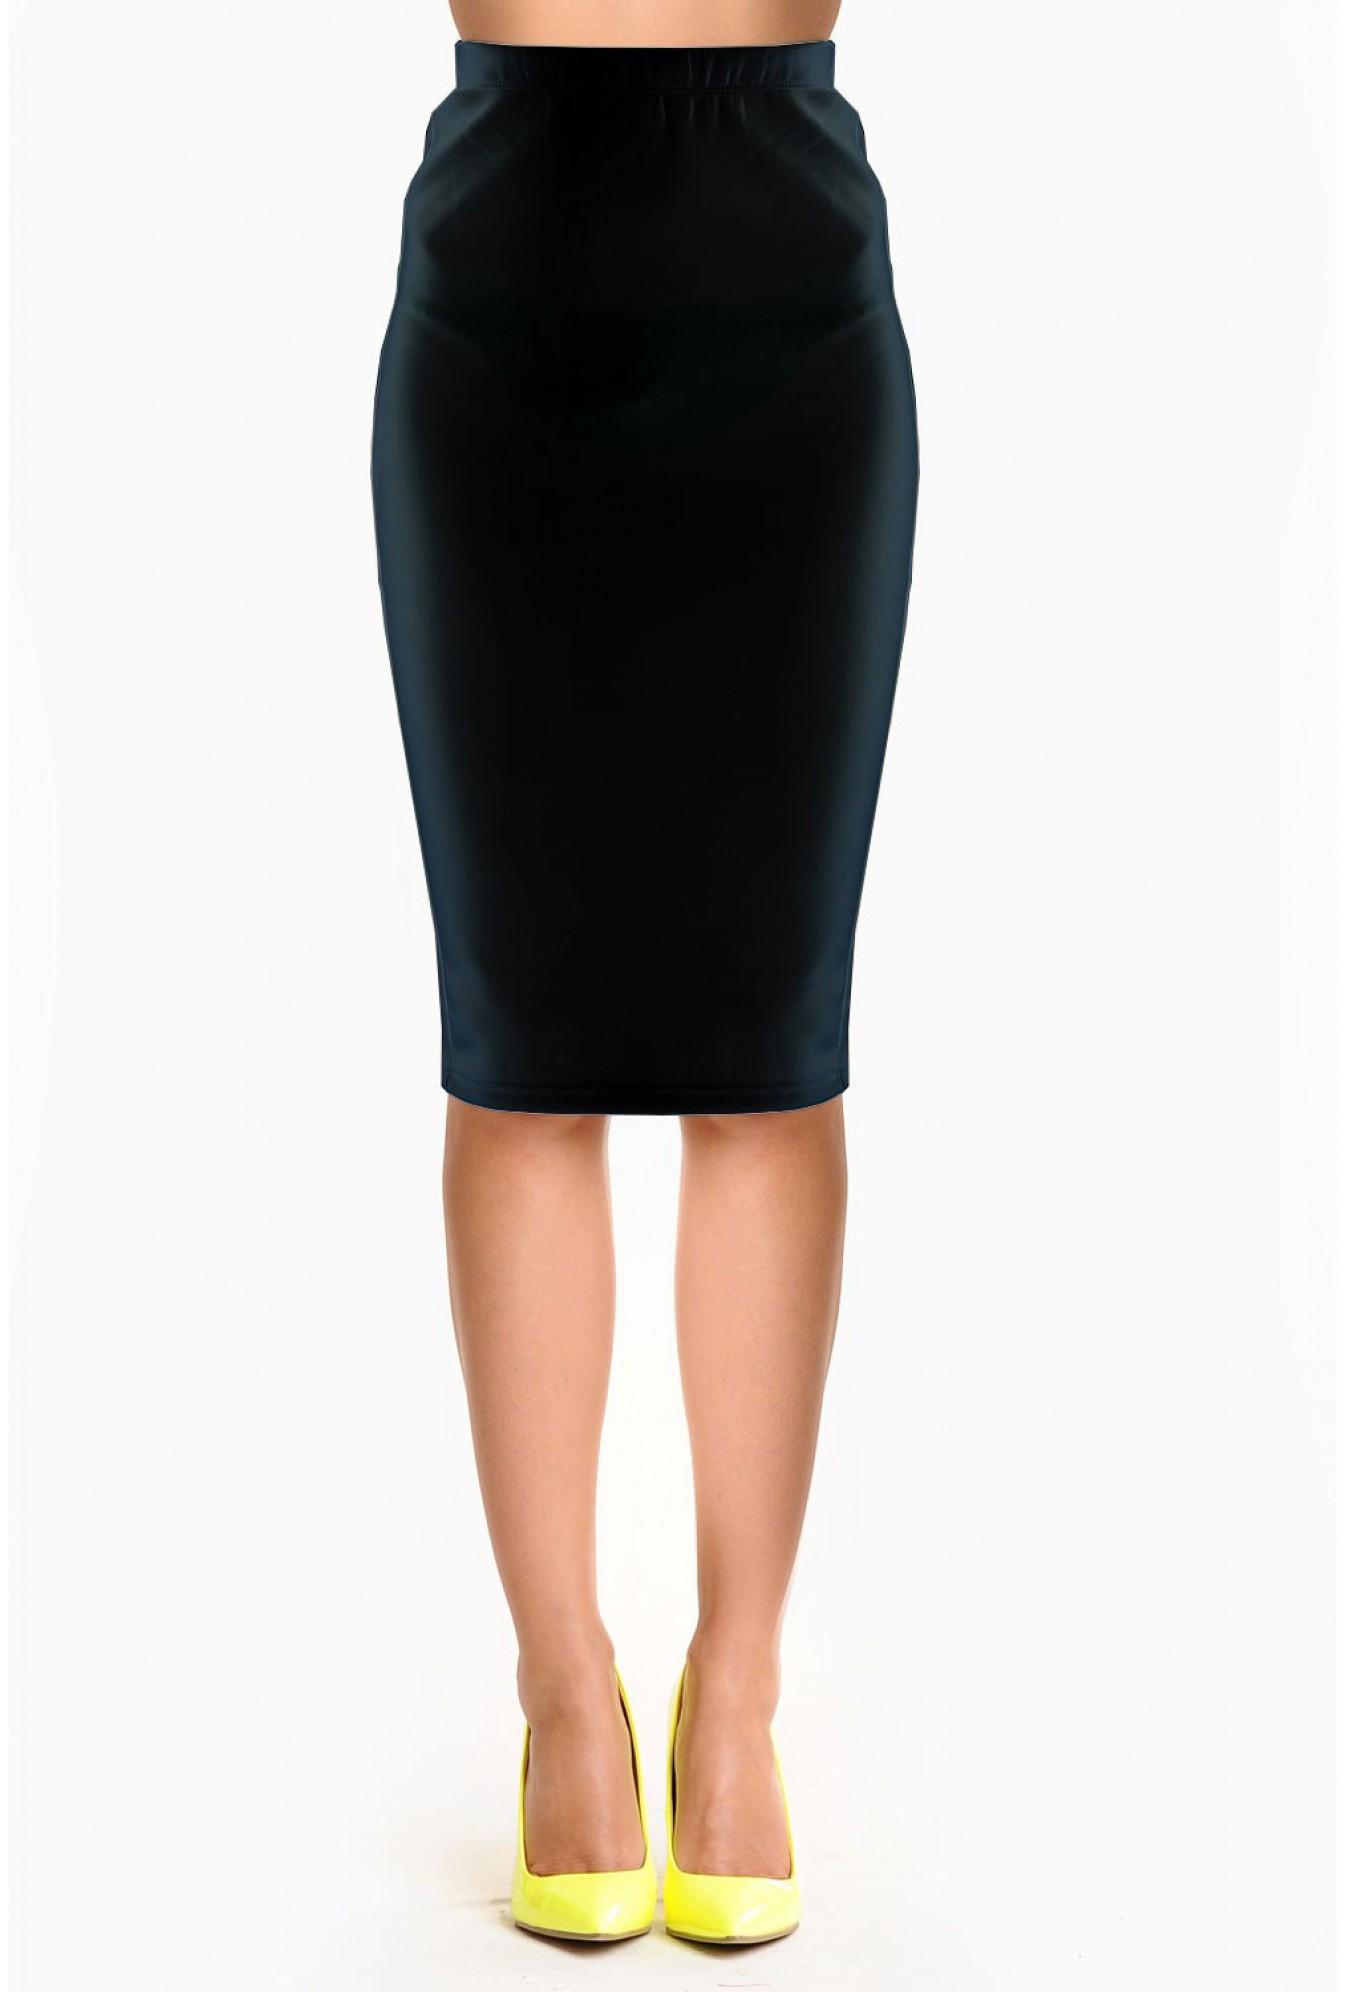 fbd44668a0 AX Paris Reese Scuba Pencil Skirt in Black | iCLOTHING